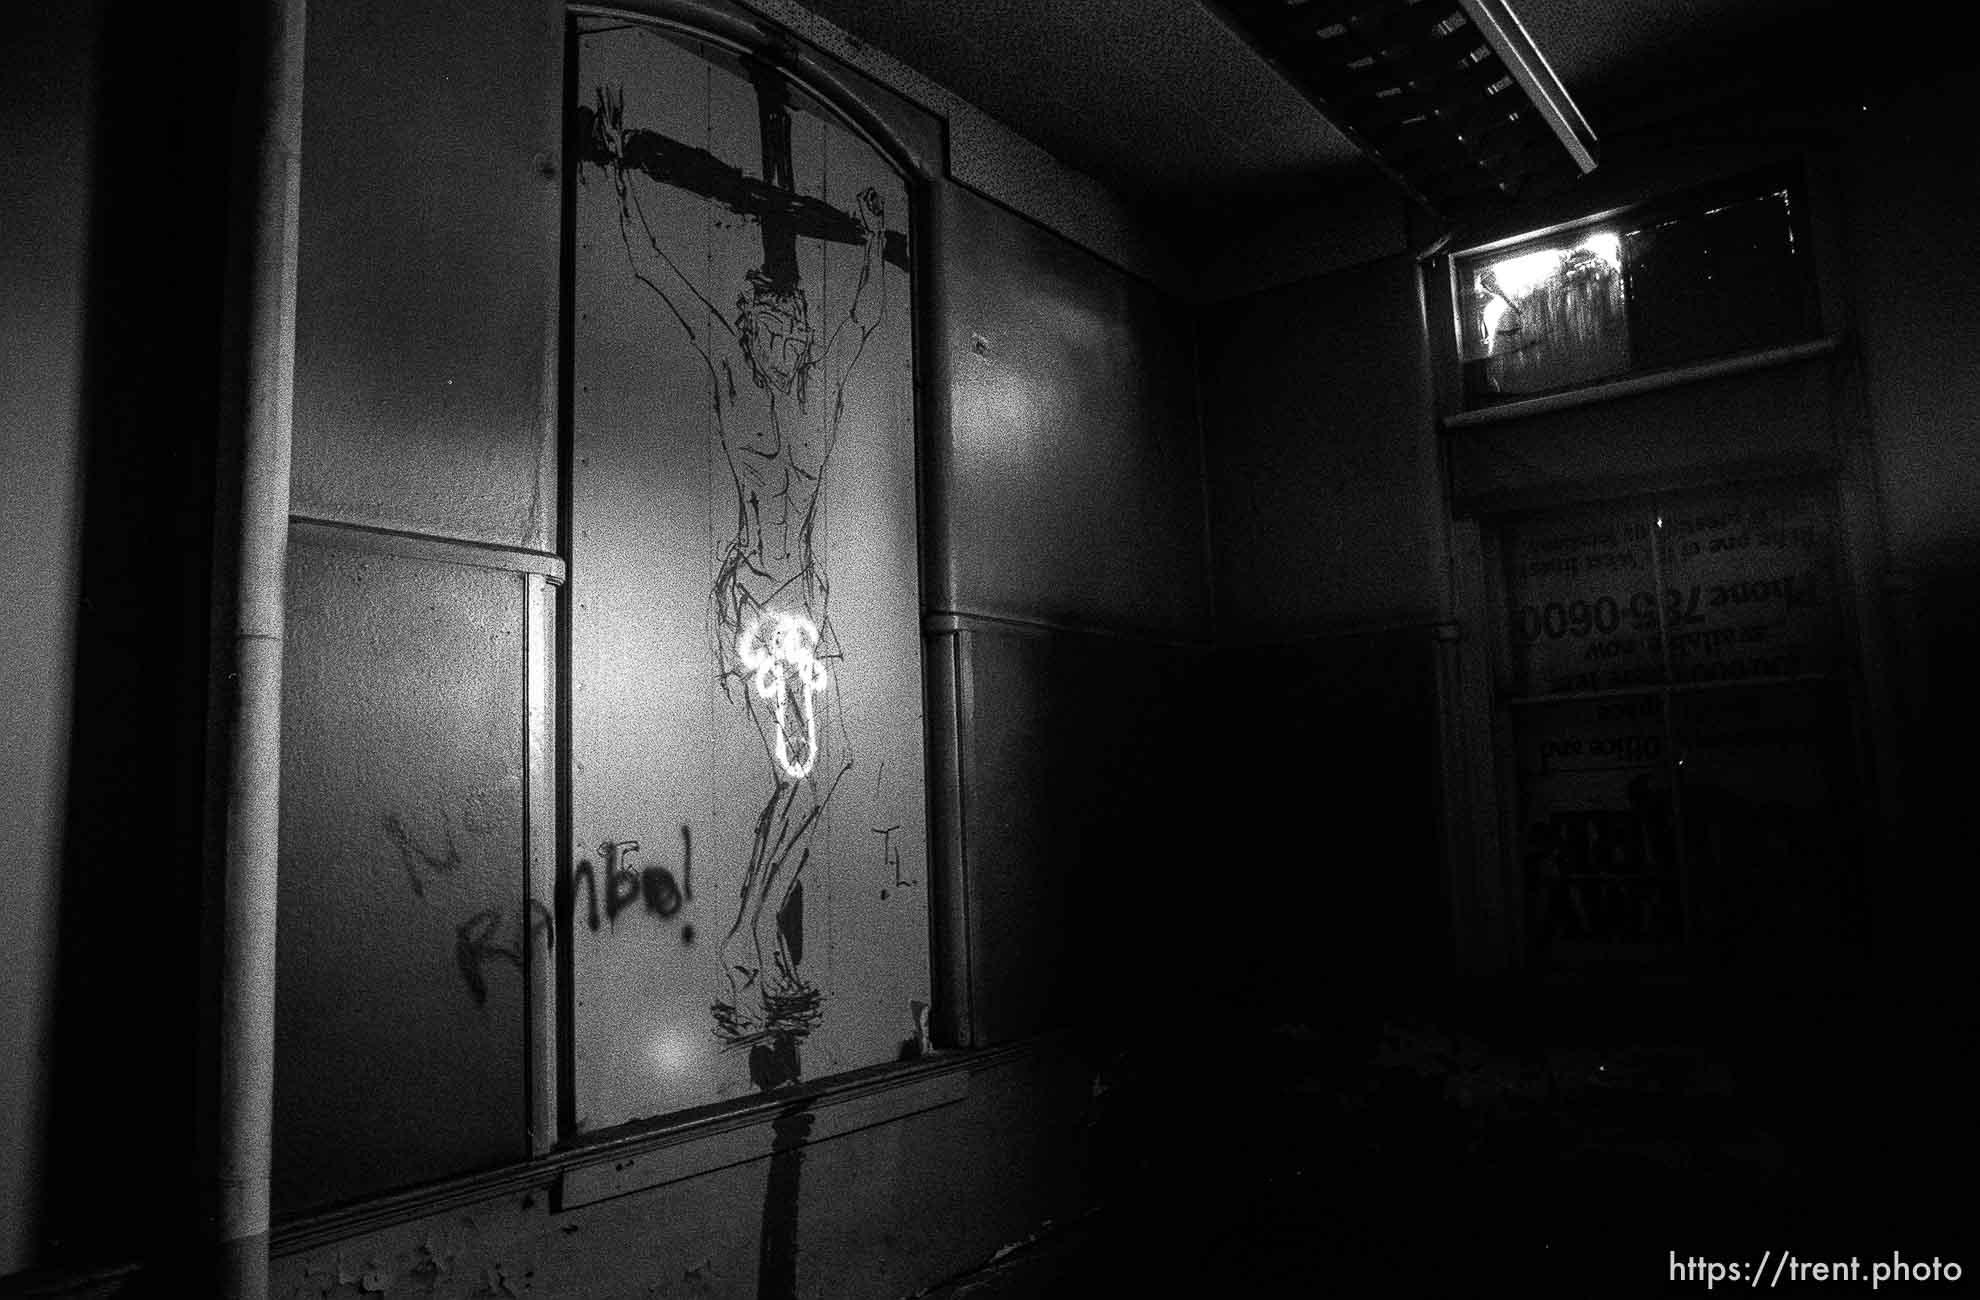 Obscene graffiti in the old Academy Building.